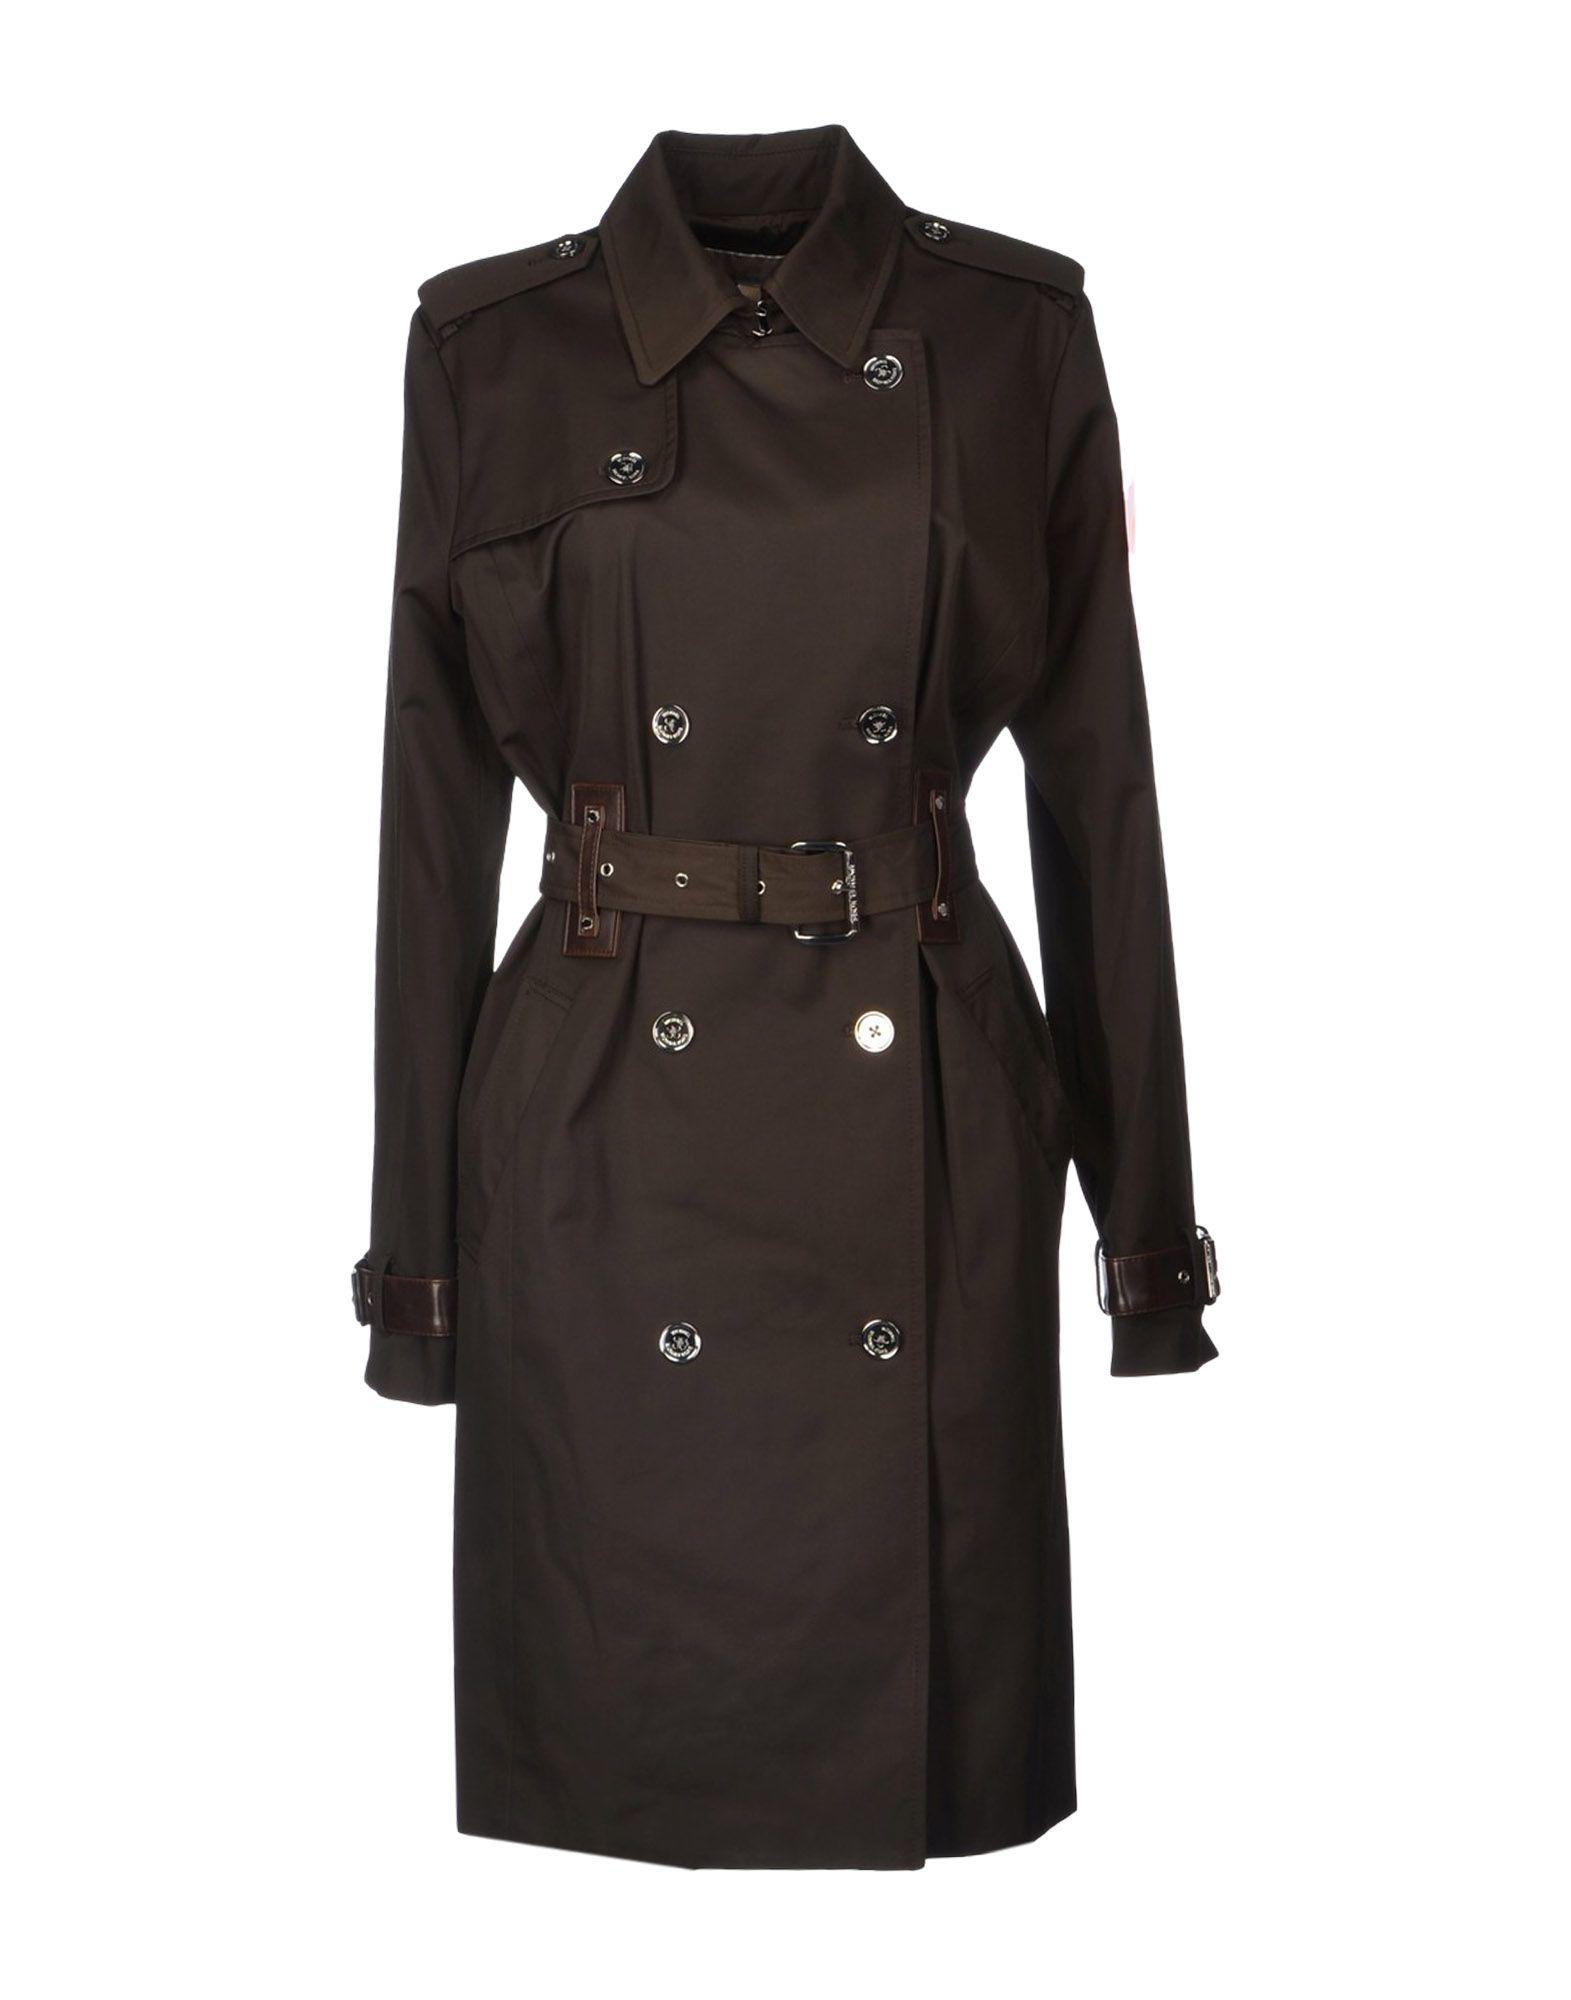 michael michael kors fulllength jacket in brown dark. Black Bedroom Furniture Sets. Home Design Ideas